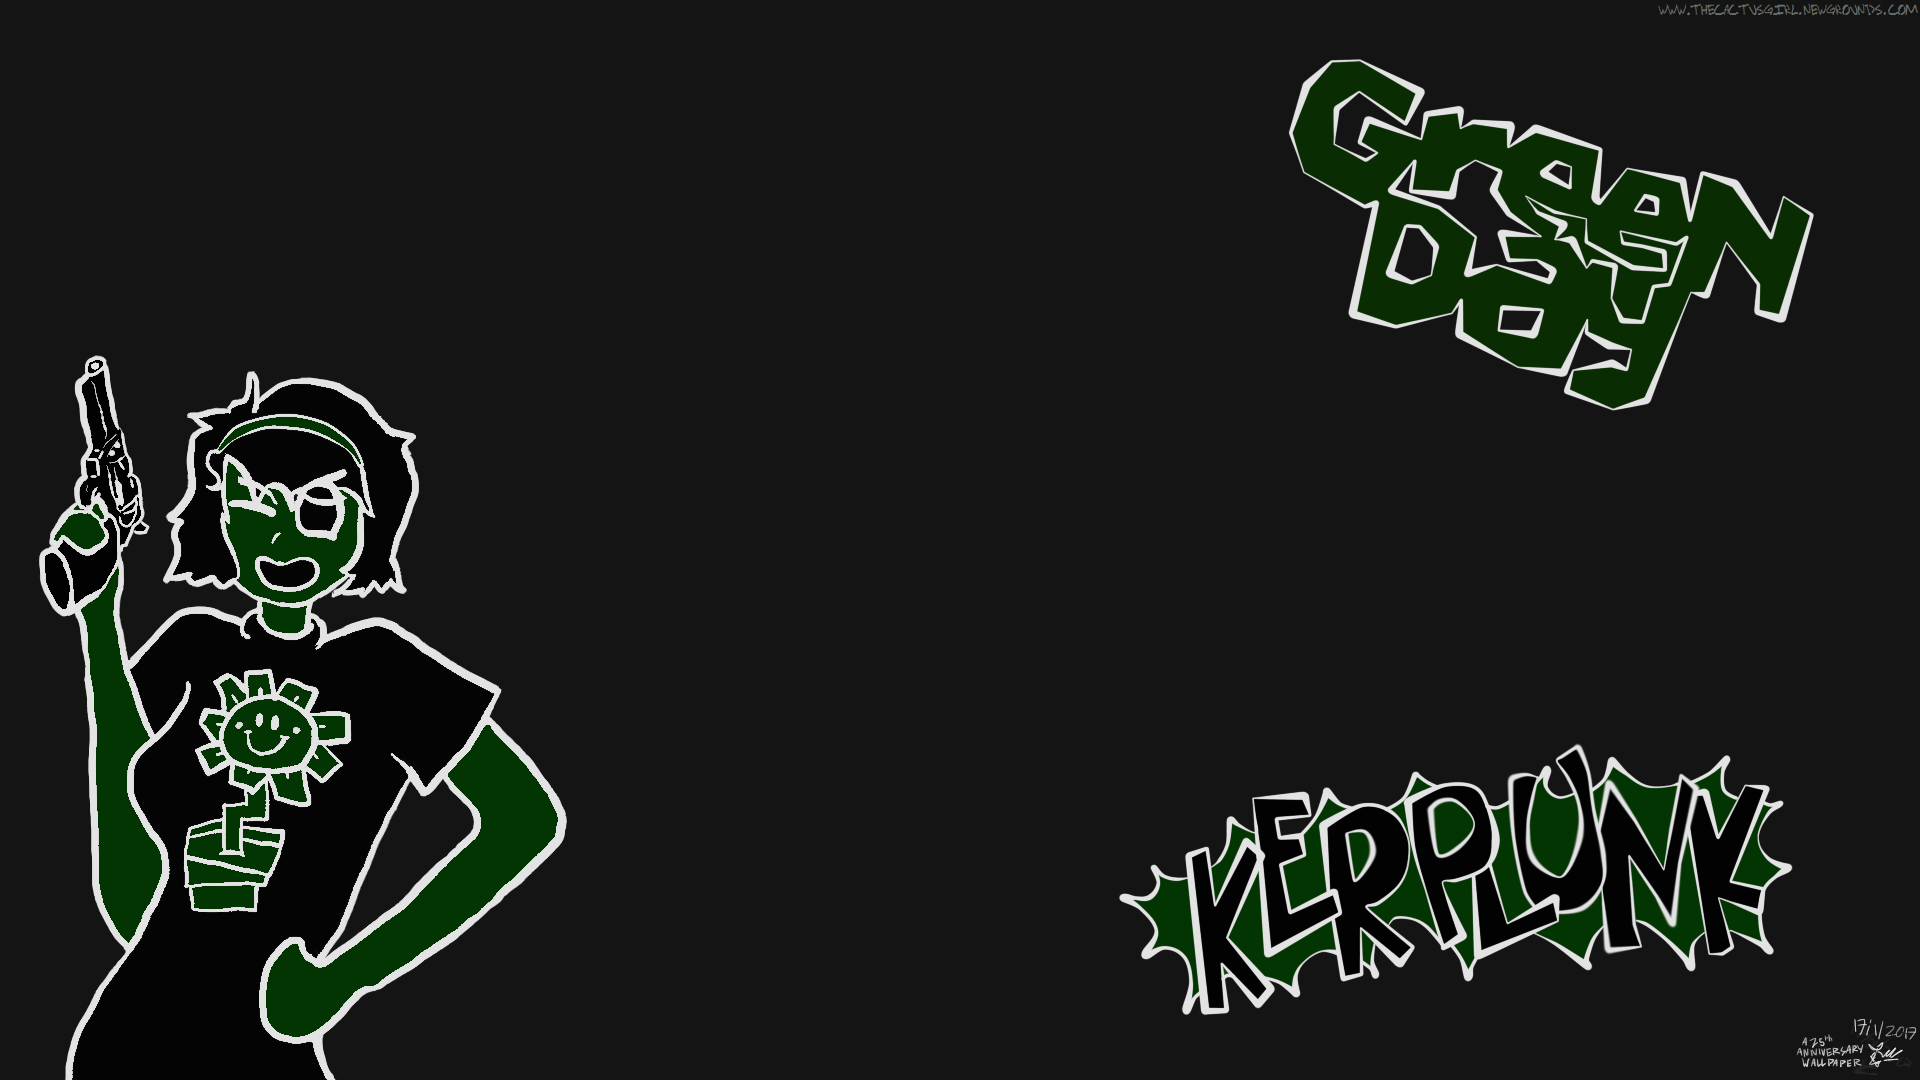 Kerplunk Wallpaper   Green Day   25th Anniversary